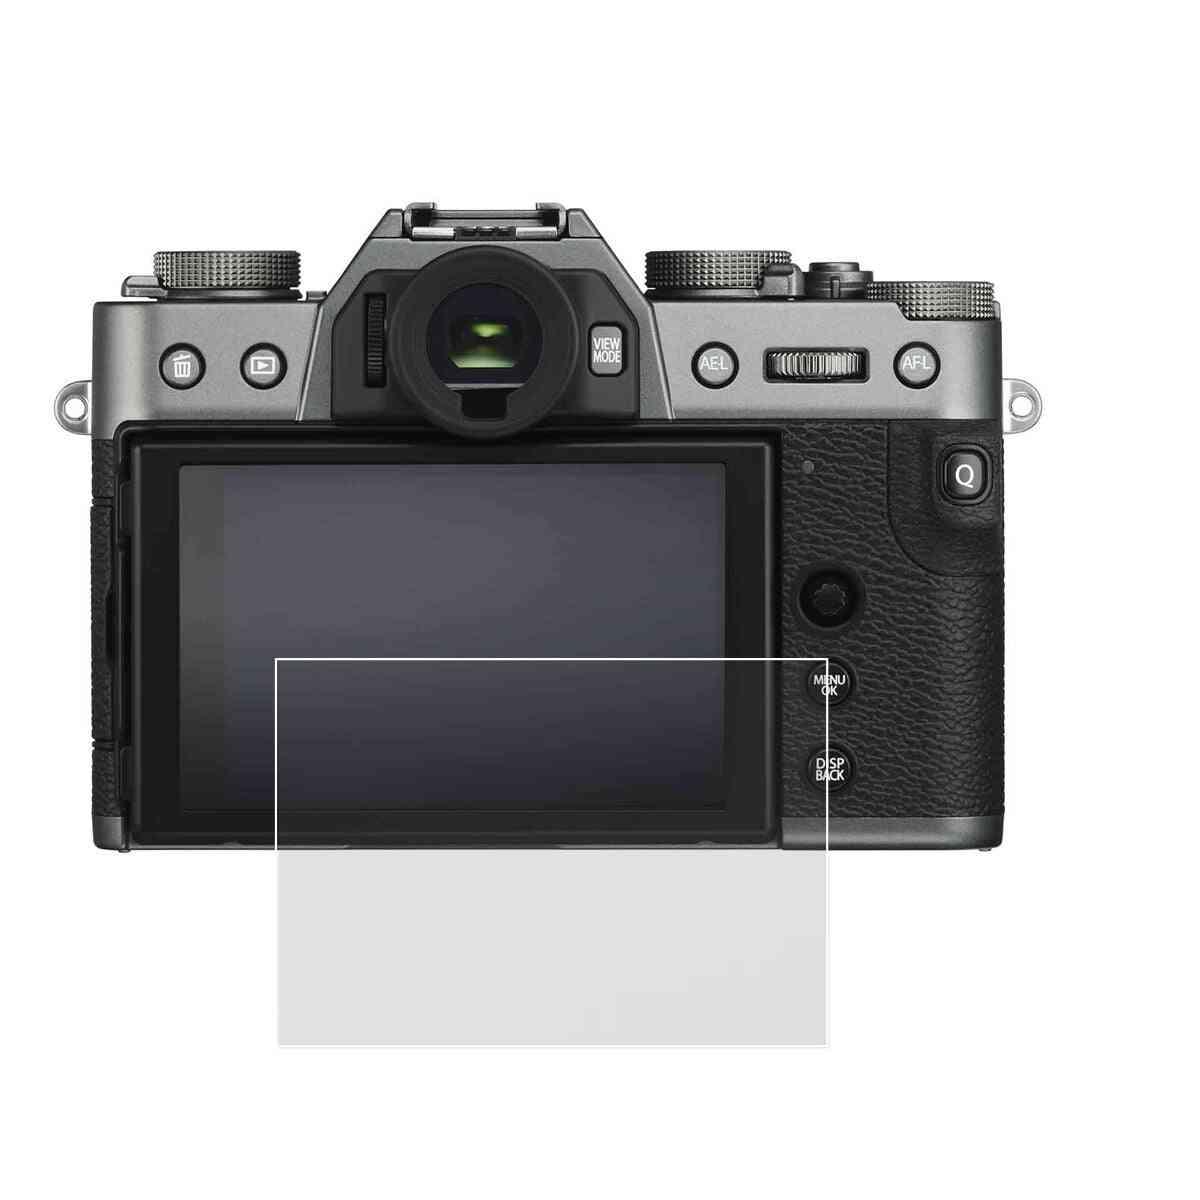 Self-adhesive Tempered Glass- Lcd Screen Protector For Fujifilm Camera